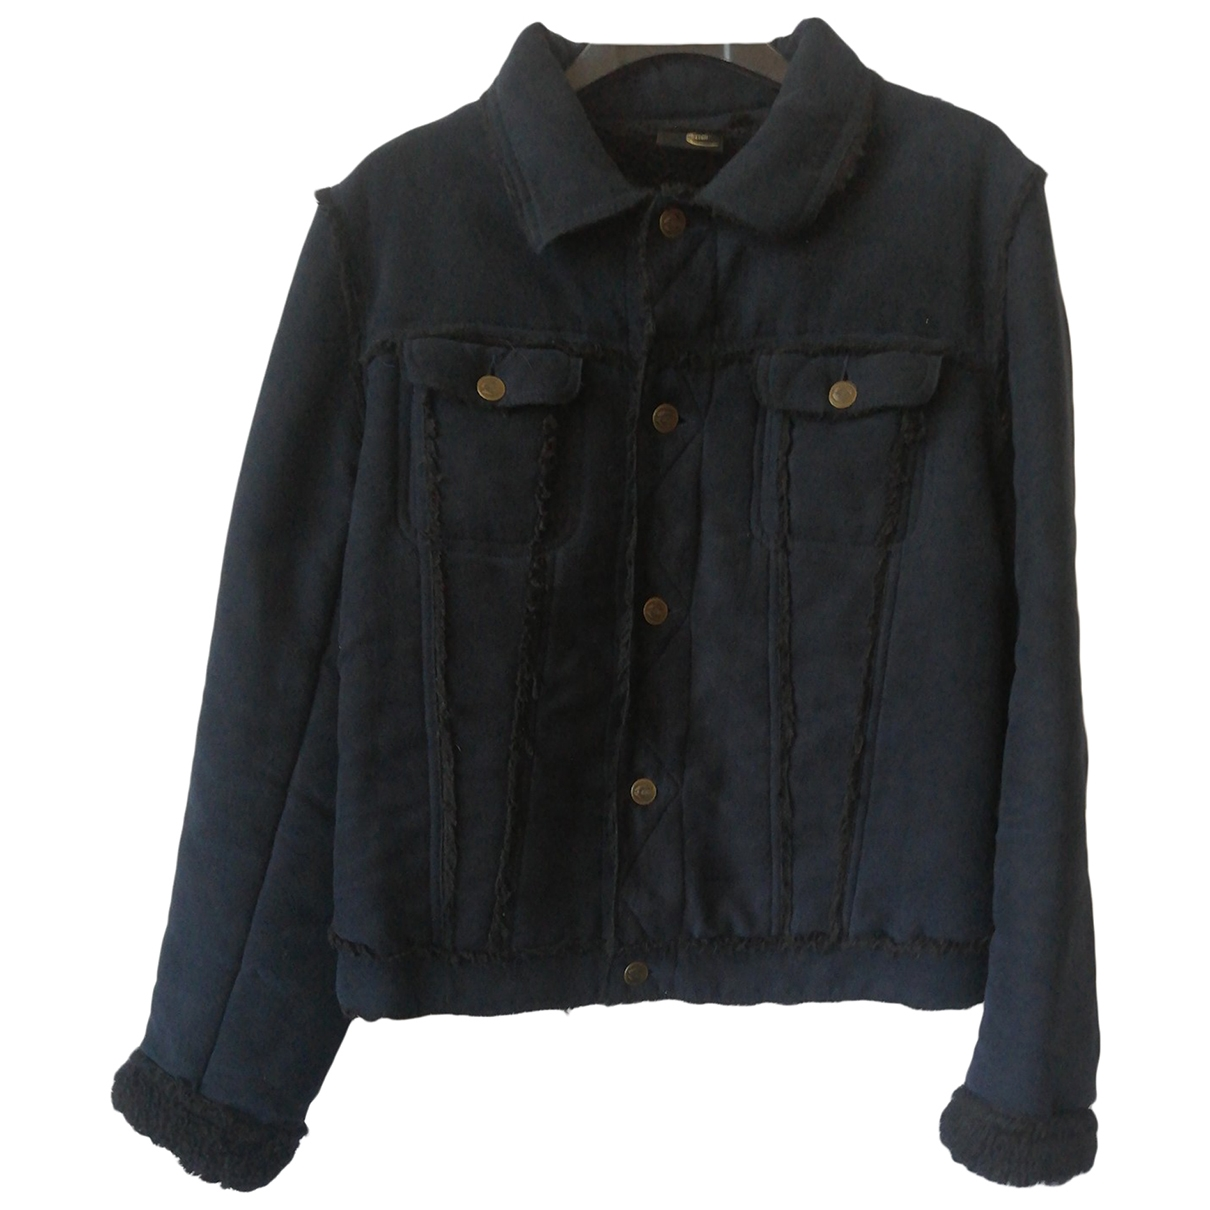 Just Cavalli \N Blue jacket for Women XL International